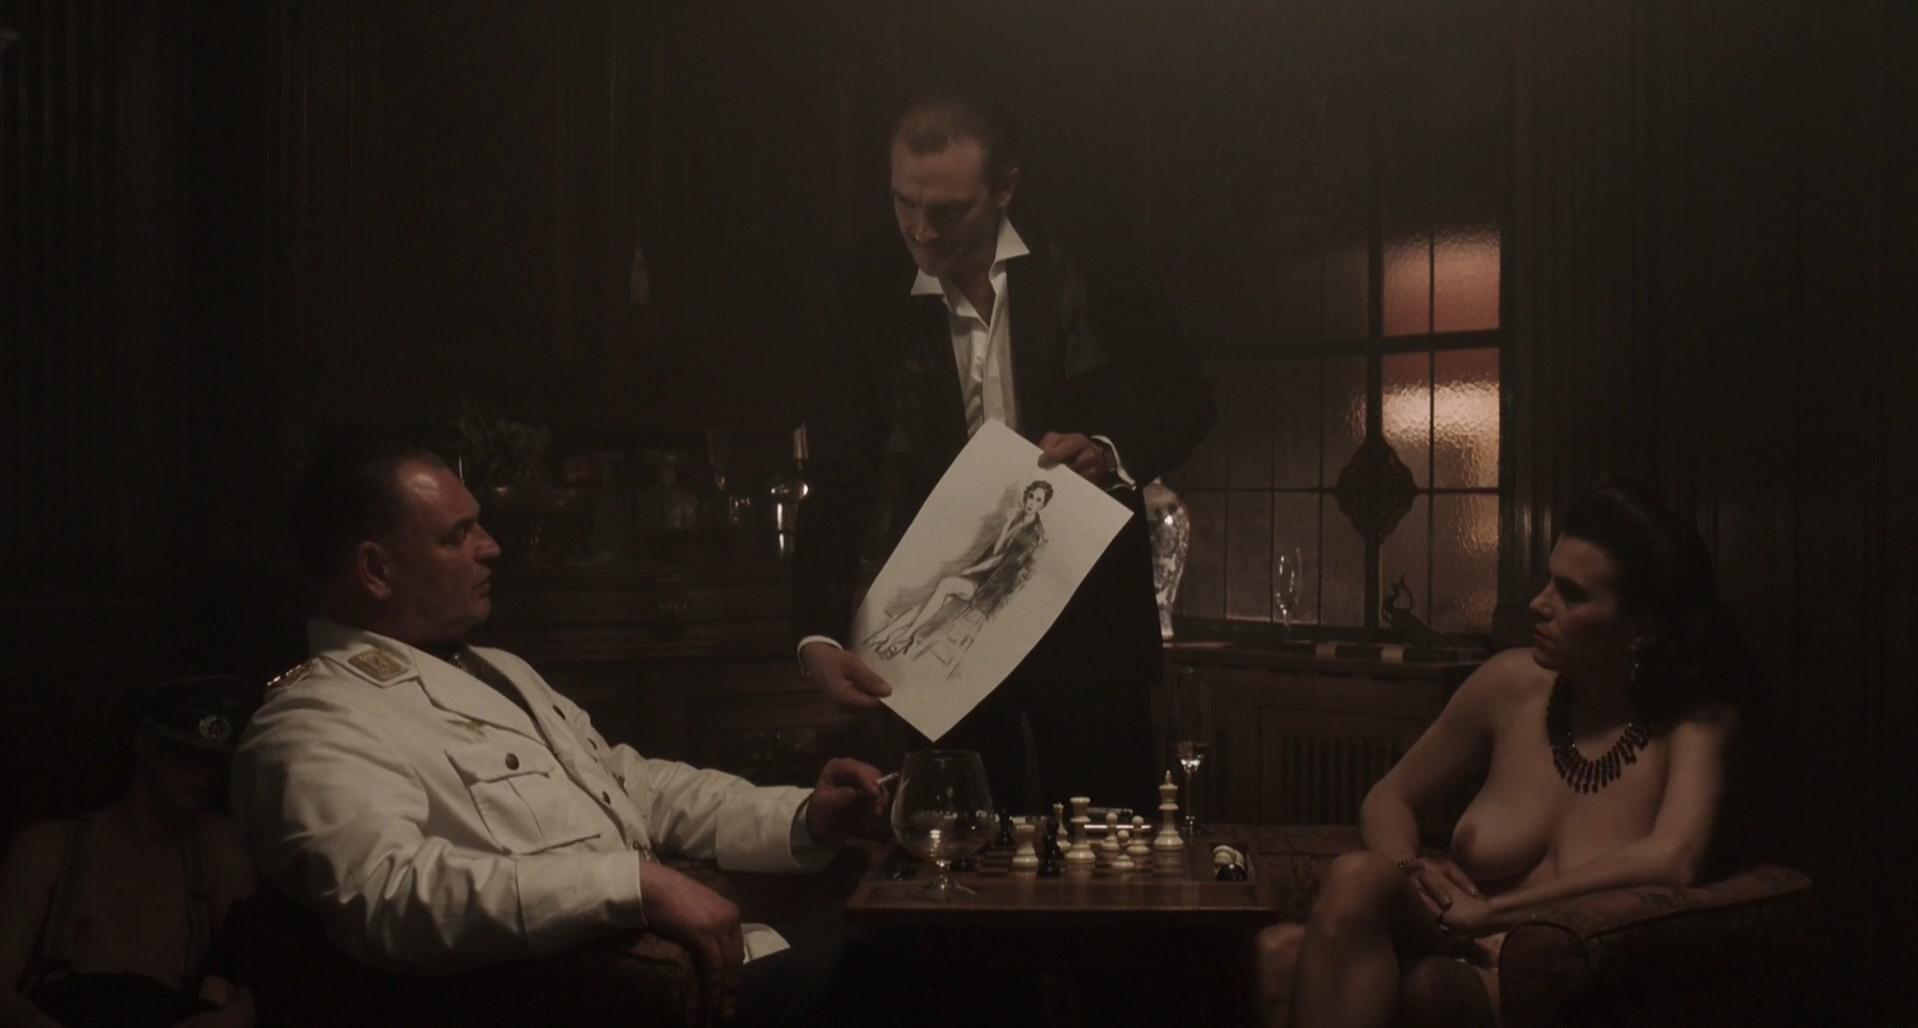 Virginia madsen nude scene in gotham movie scandalplanetcom - 2 part 9